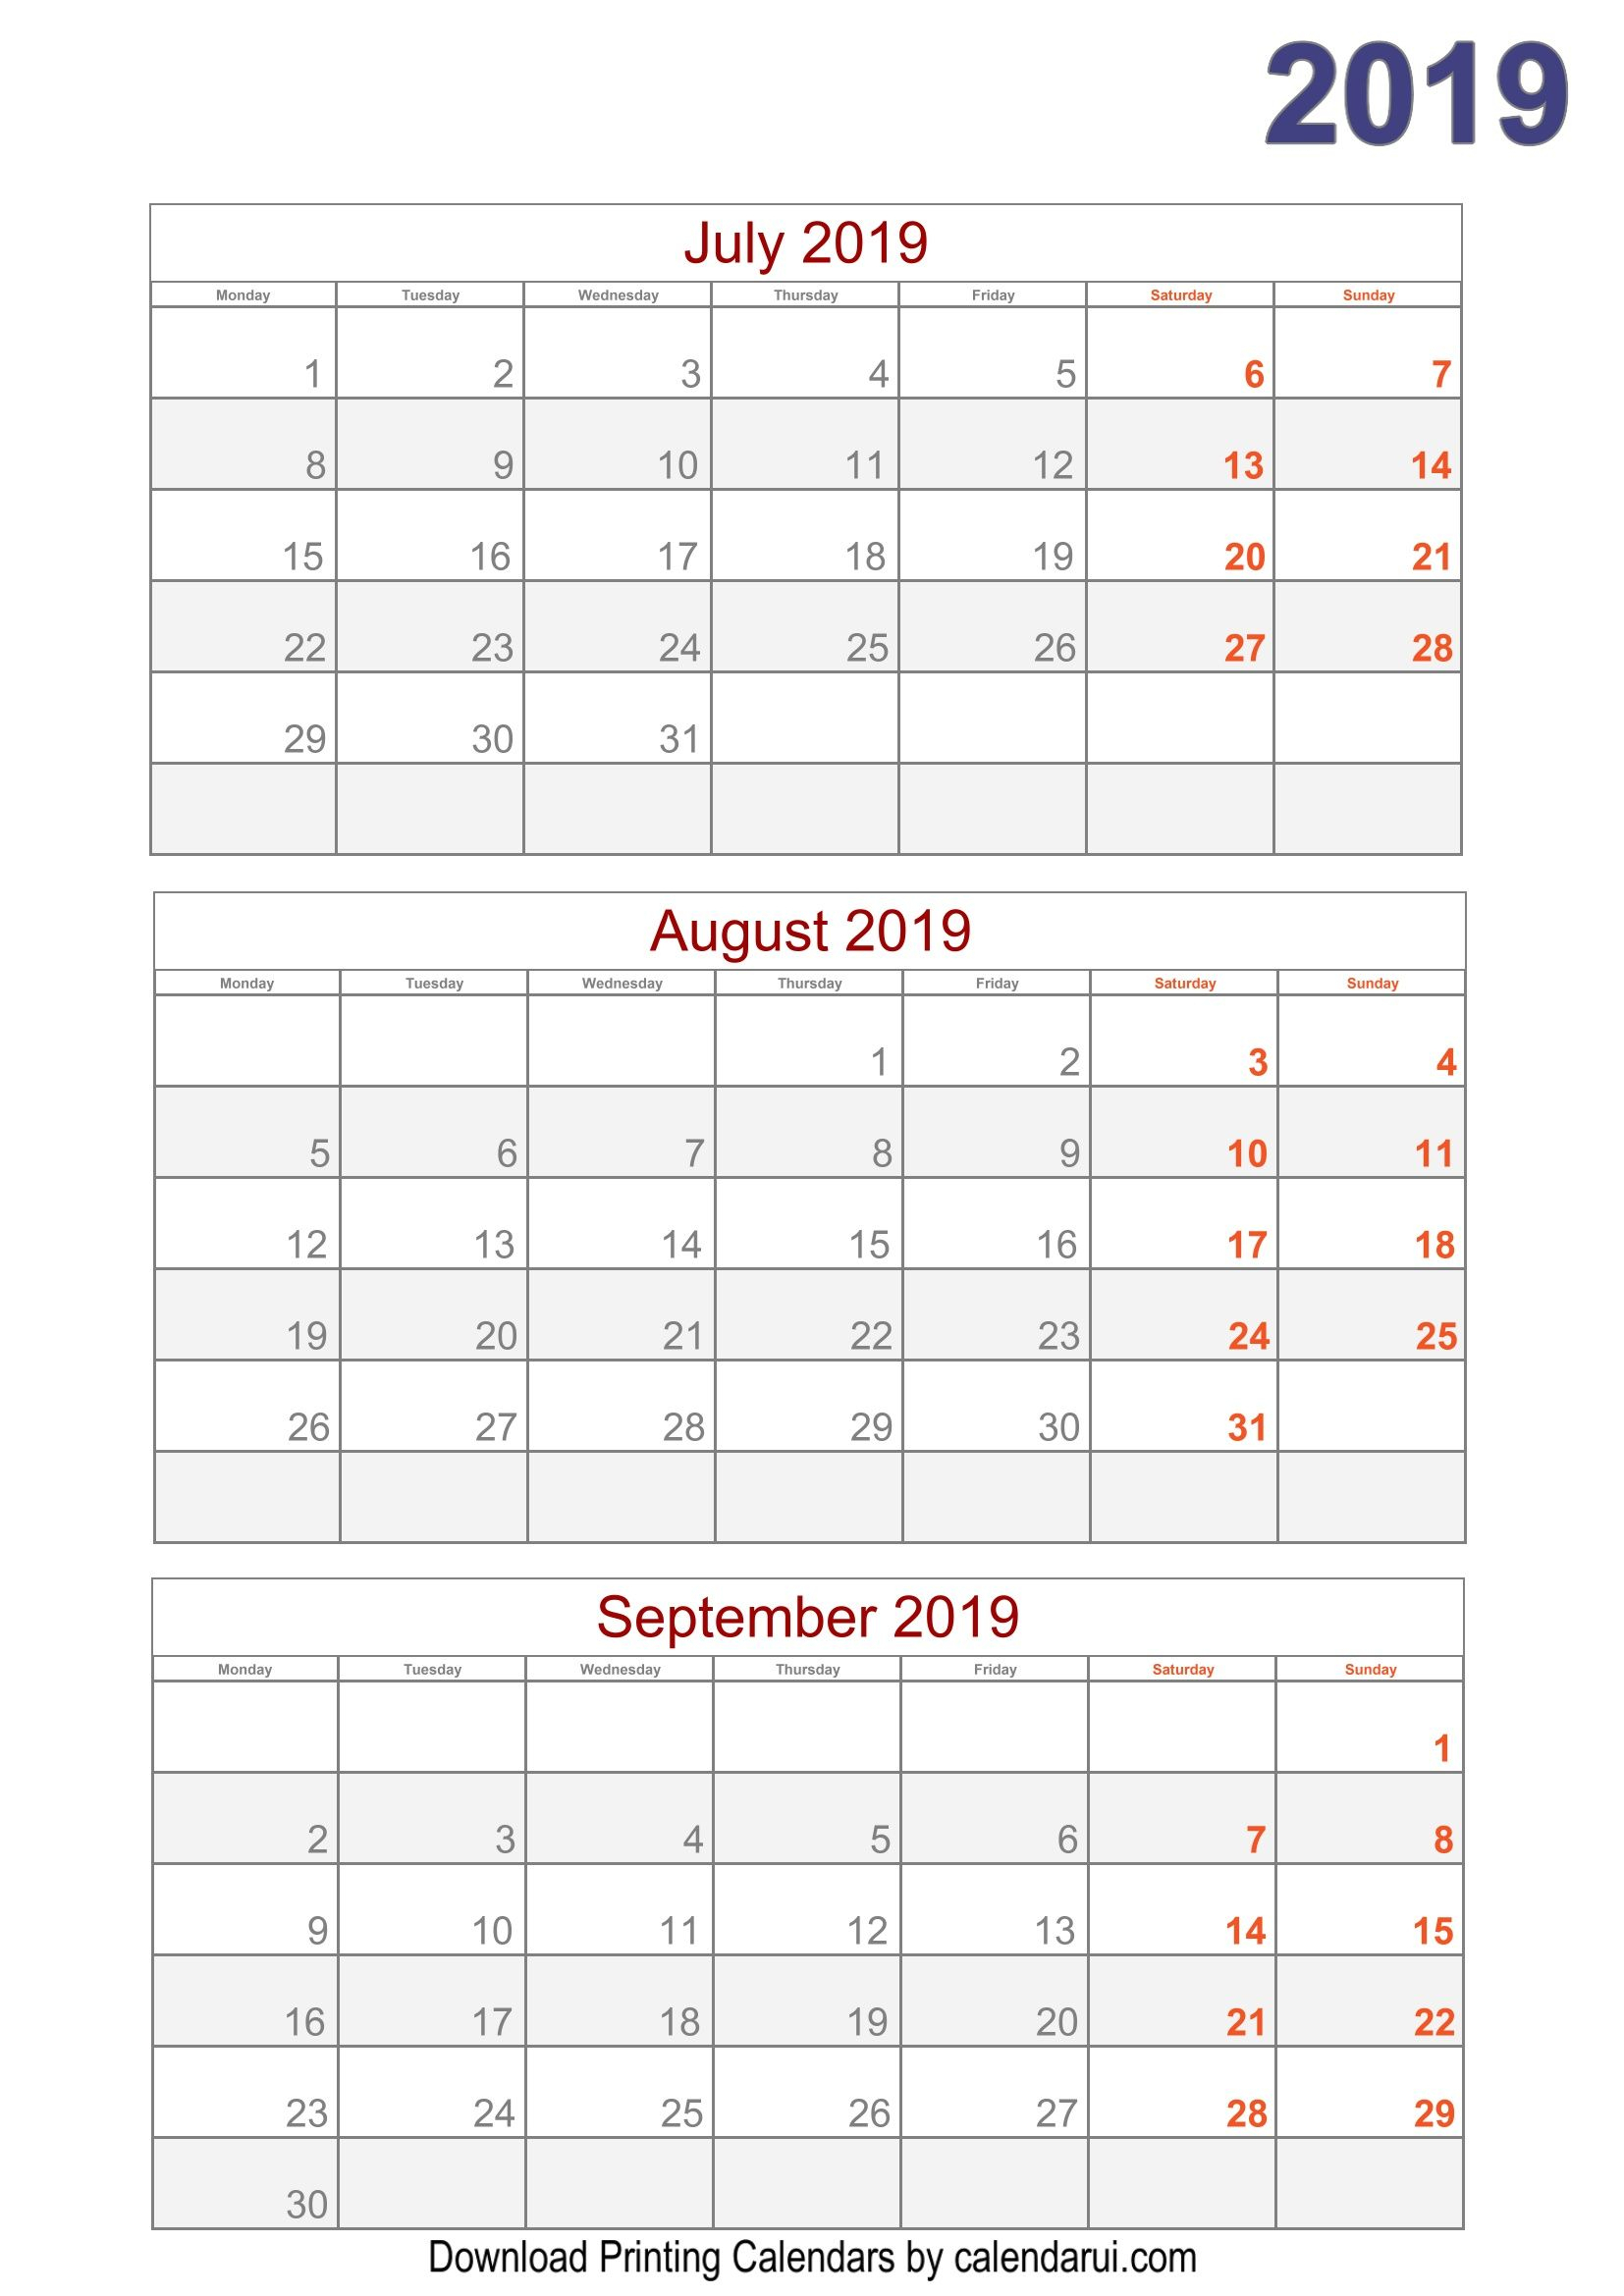 Download 2019 Quarterly Calendar Printable For Free | Calendar within 2020 Printable Calendar Templates Quarterly